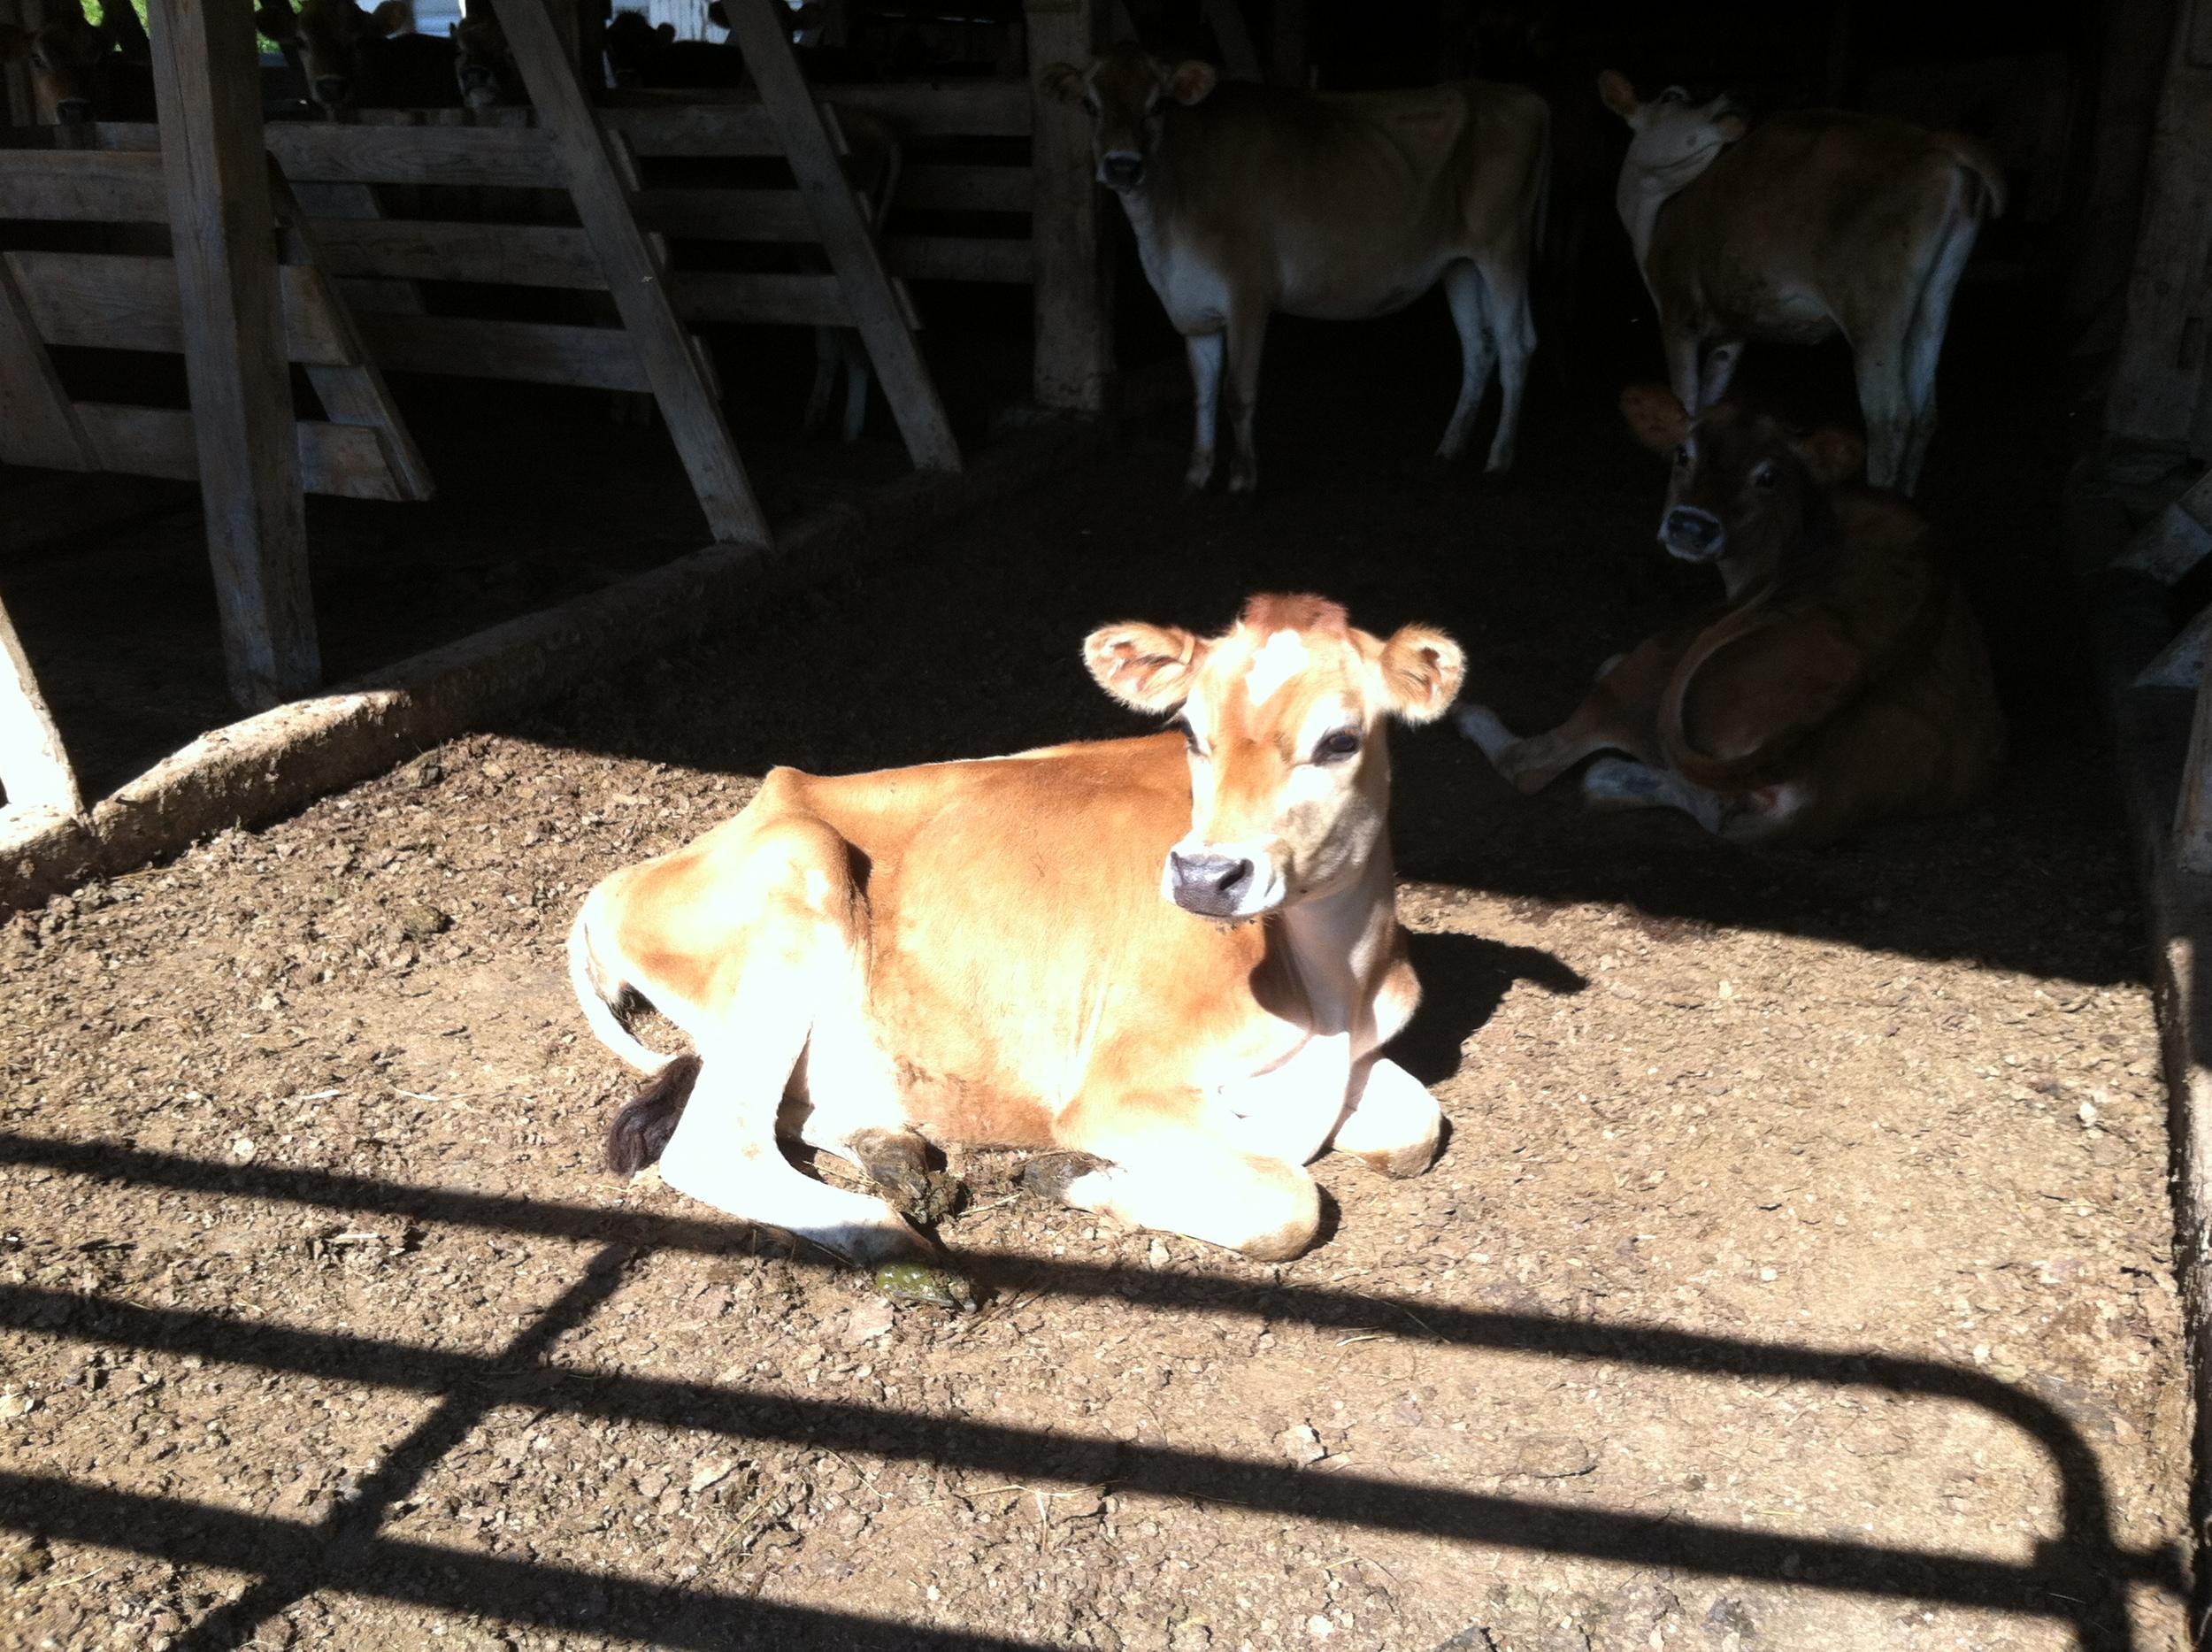 Wee heifer sunning herself.